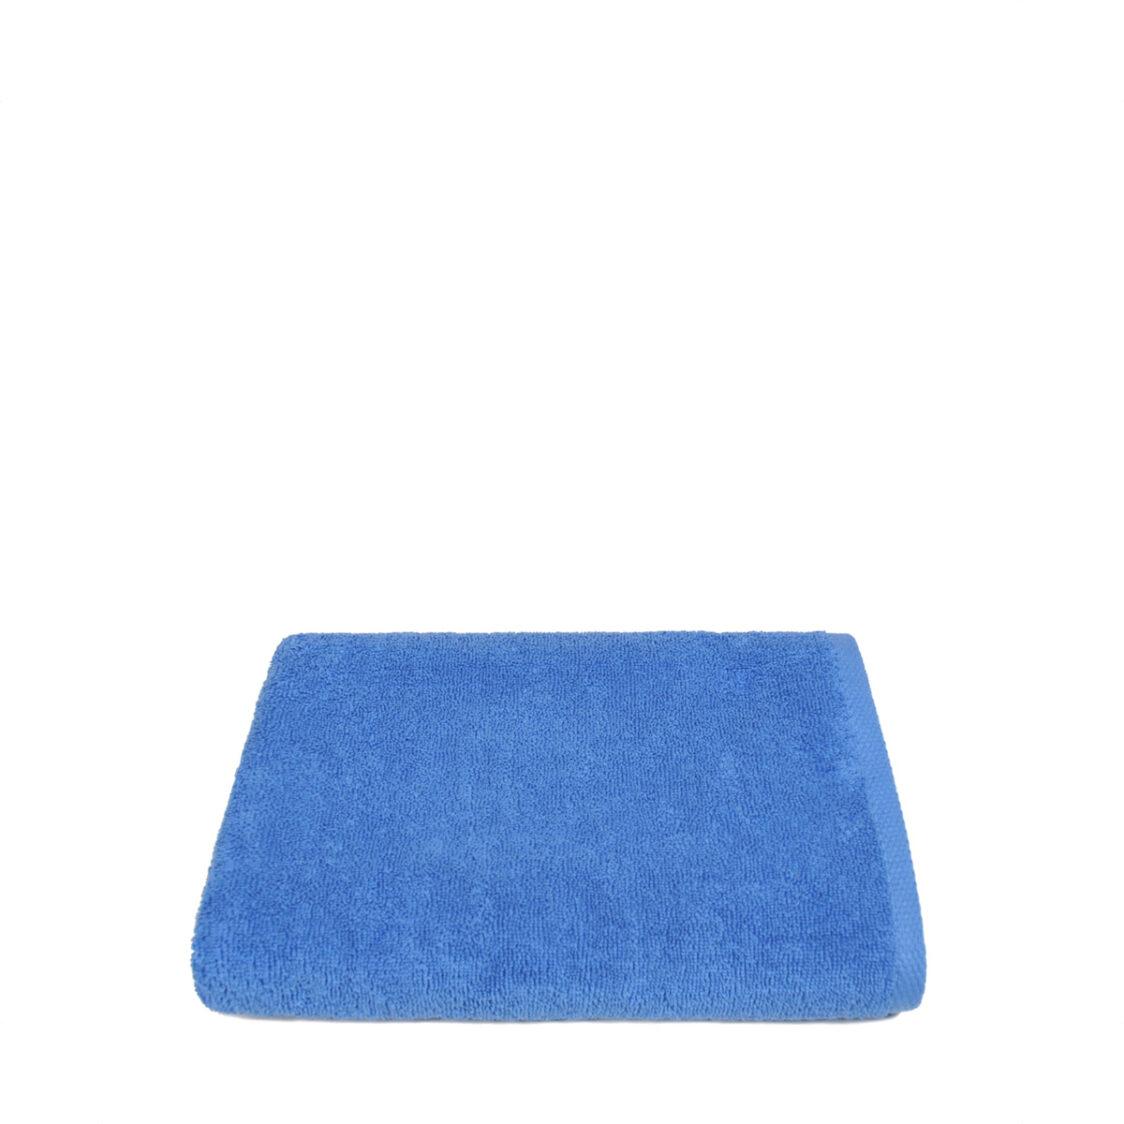 Red Orange Delight Bath Towel Blue